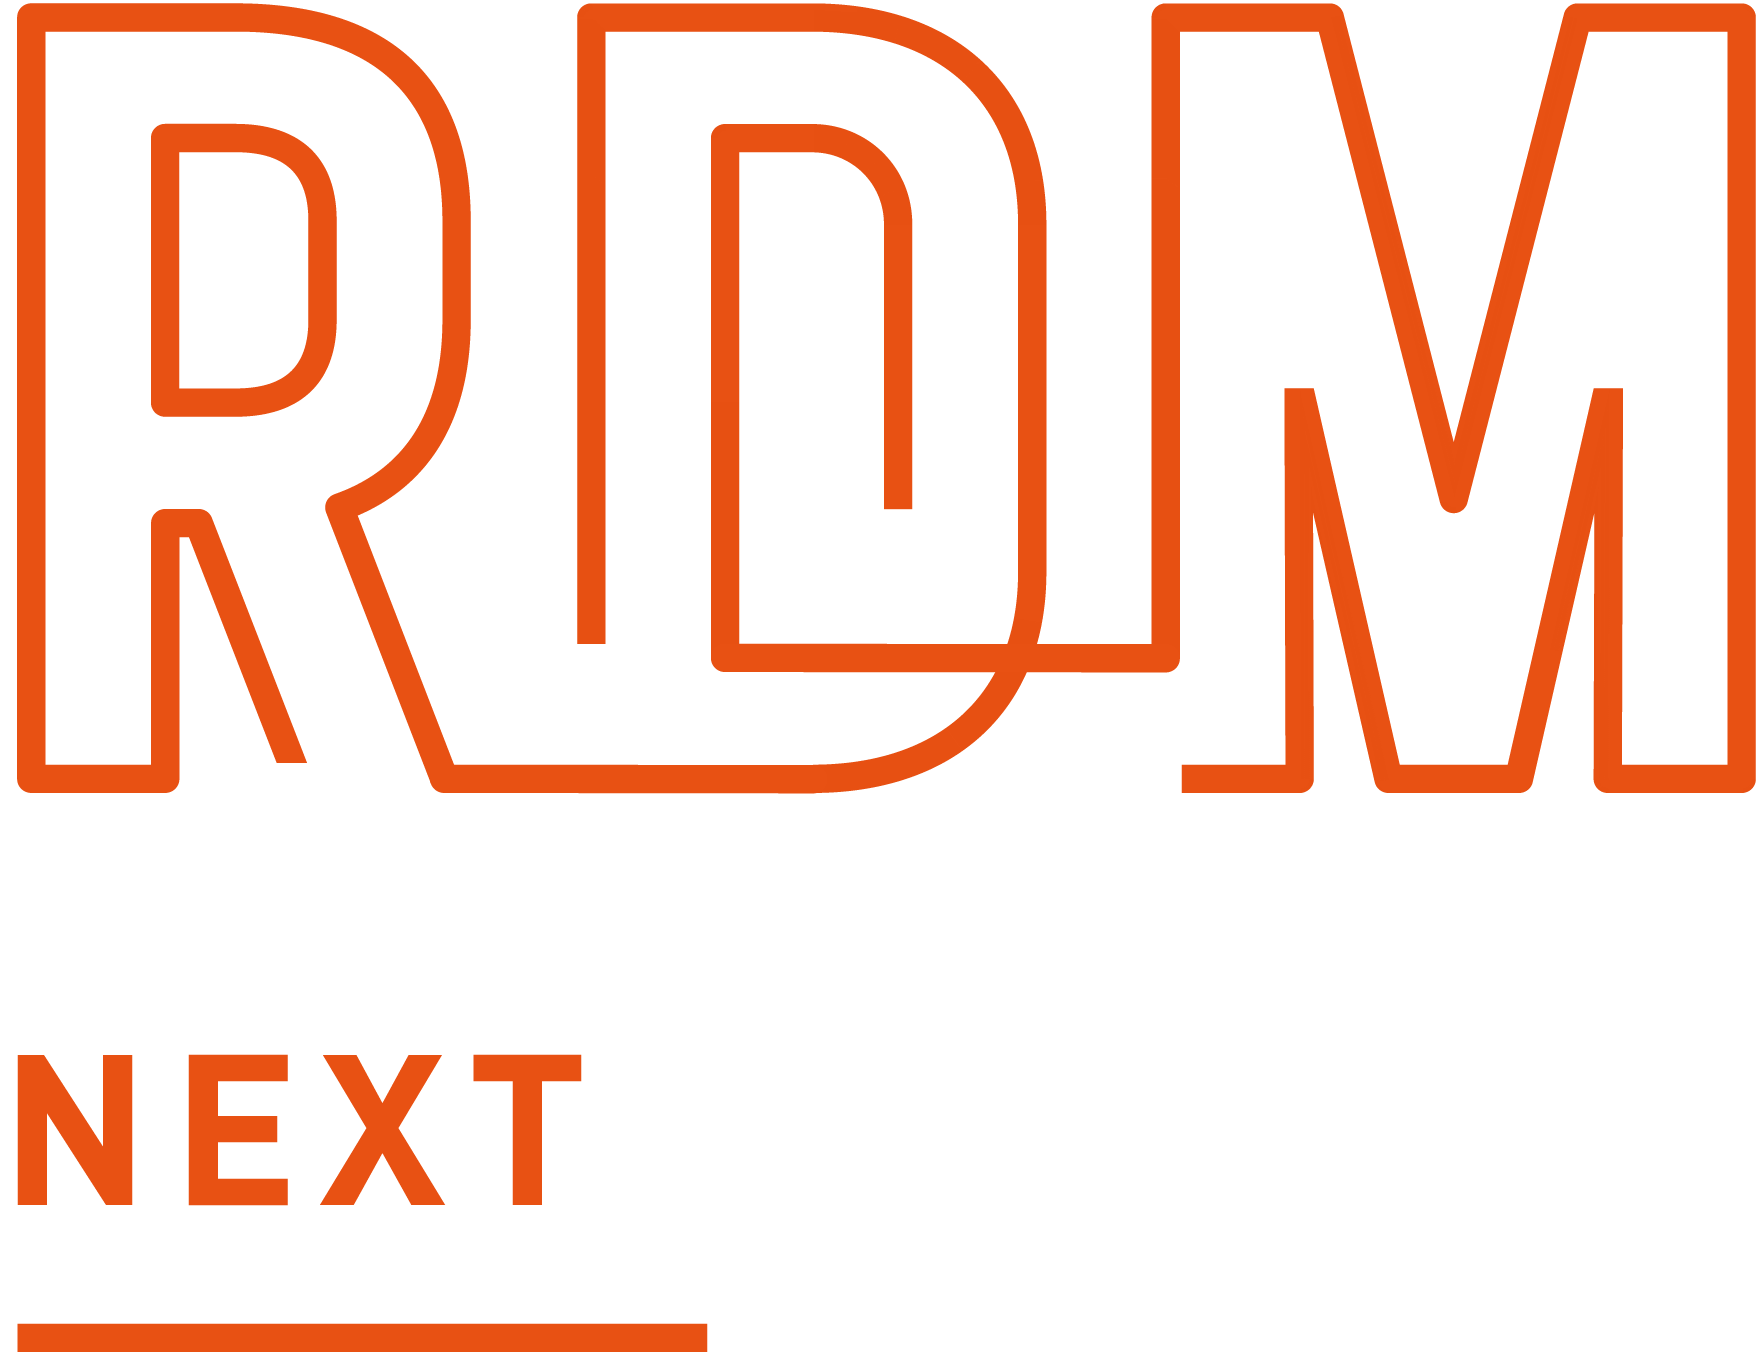 RDM Next